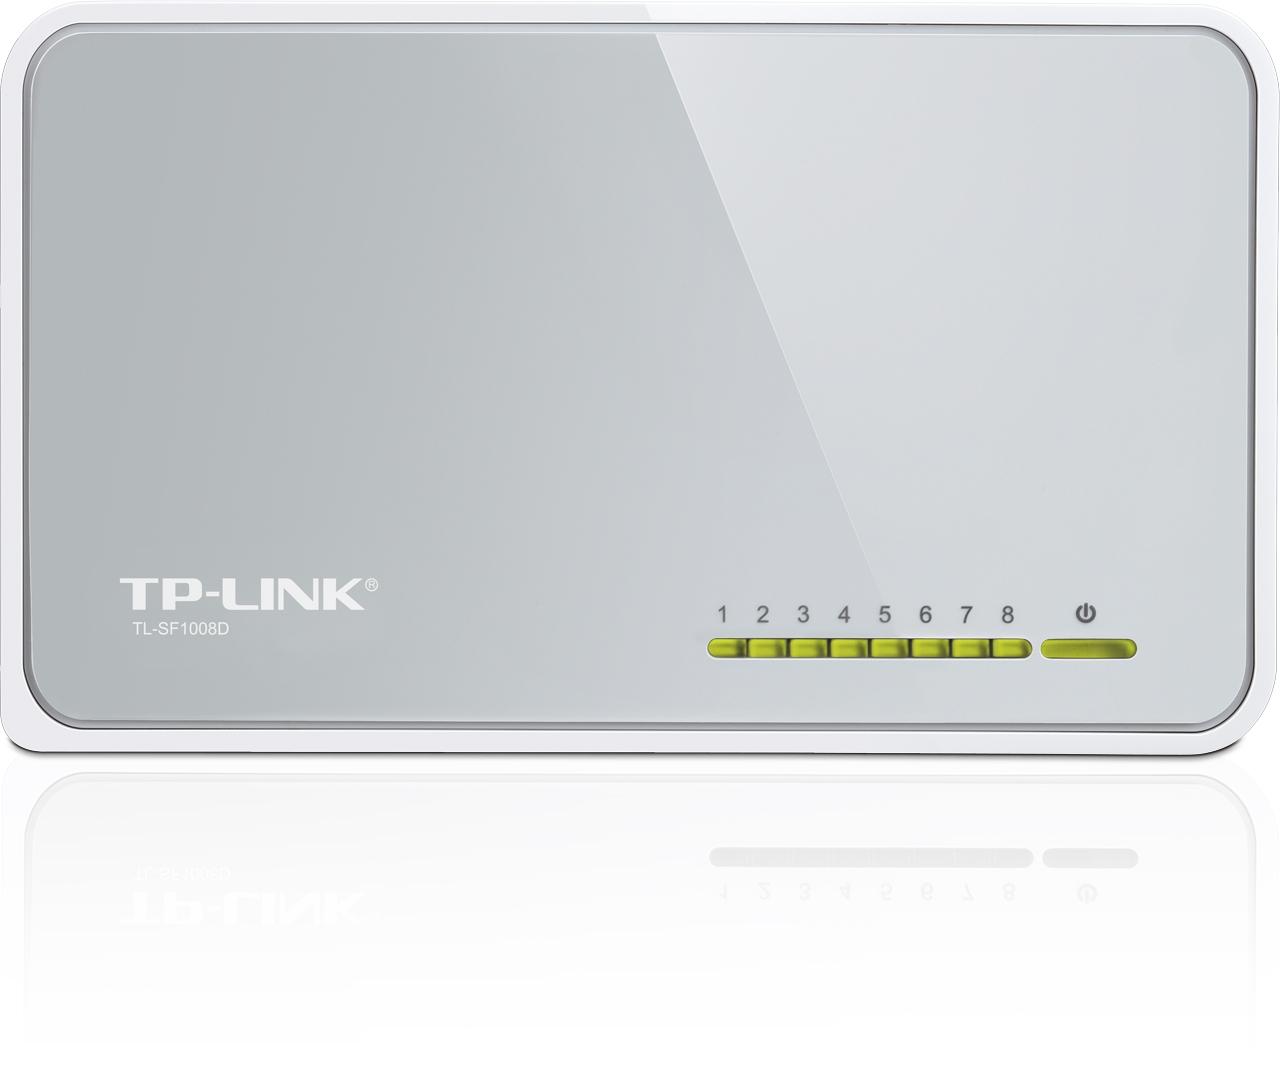 Kit de démarrage mini-adaptateur CPL AV200 3ports 10/100Mbps